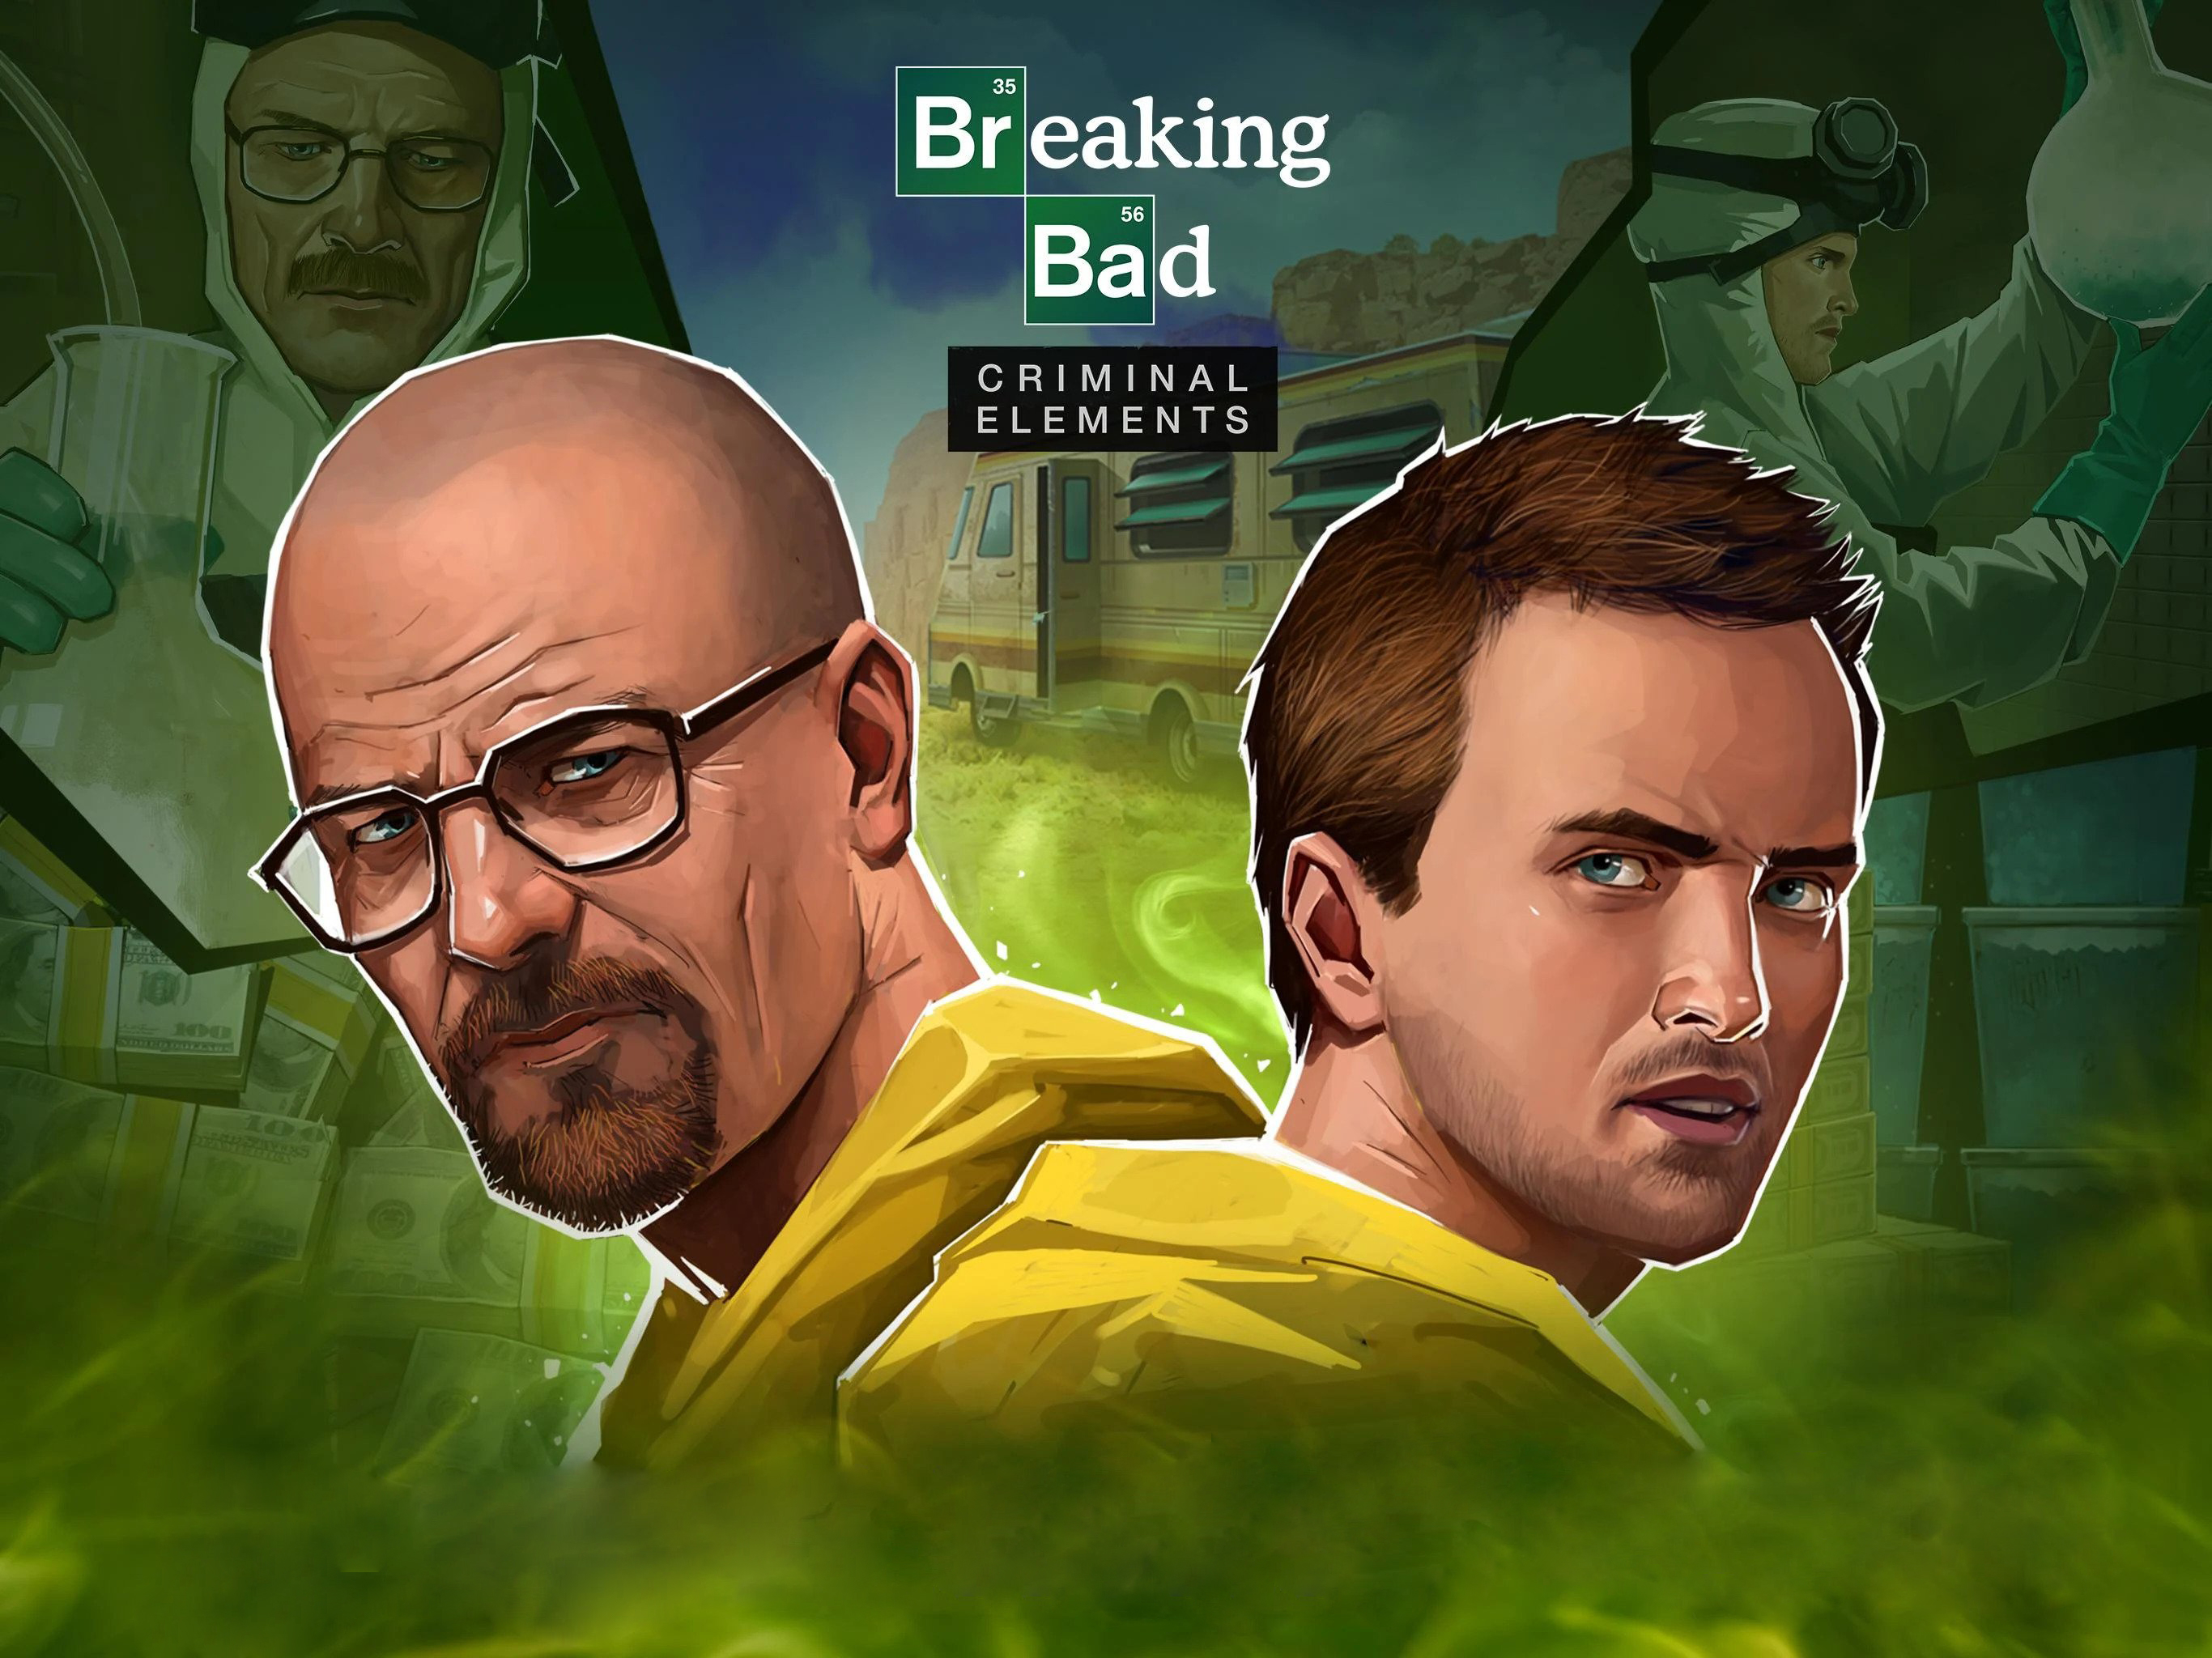 Breaking Bad Criminal Elements Wallpaper Hd Games 4k